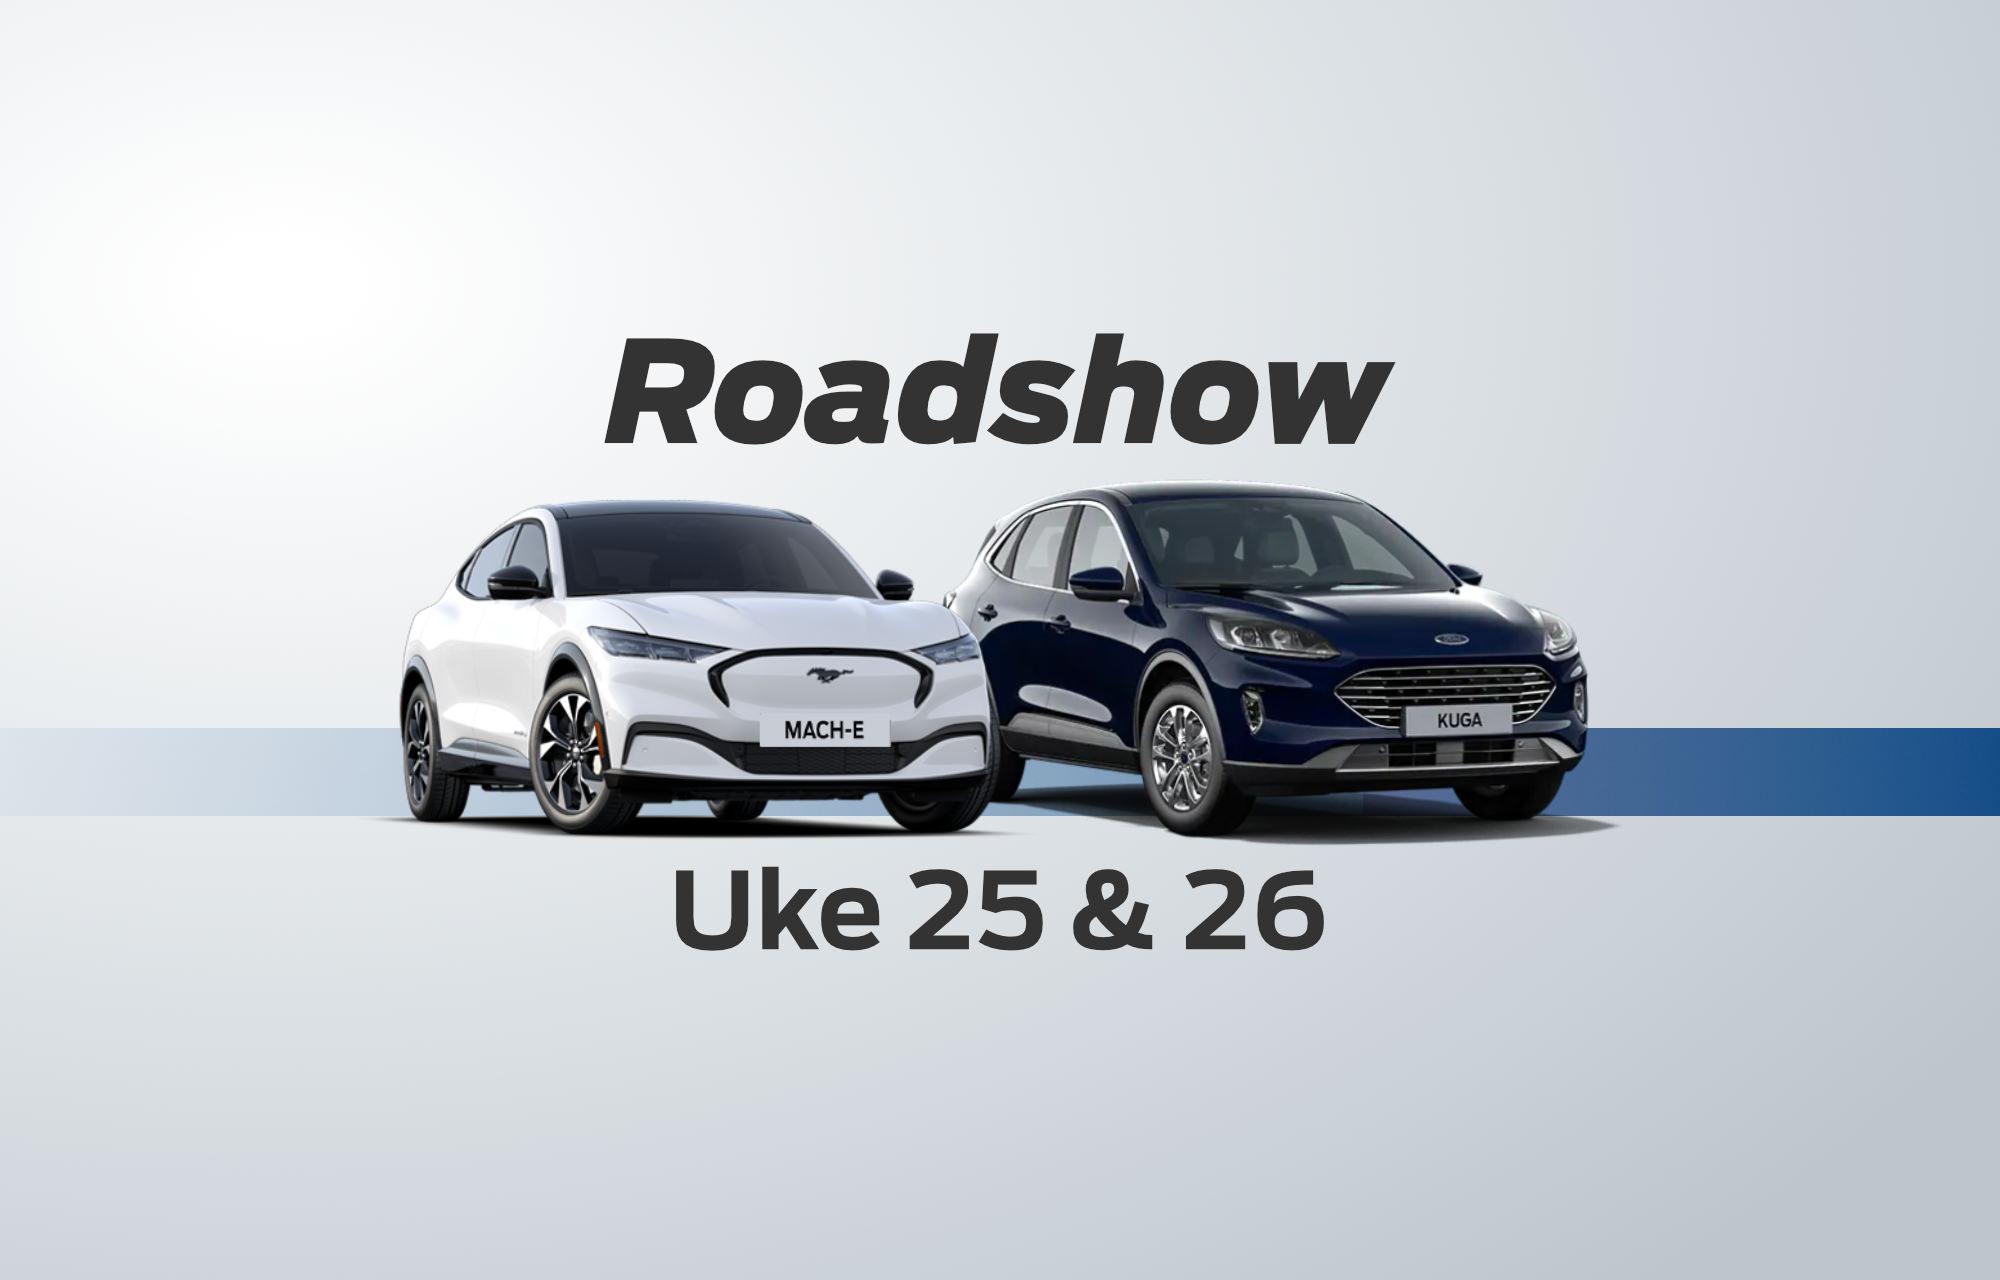 Roadshow uke 25 og 26!